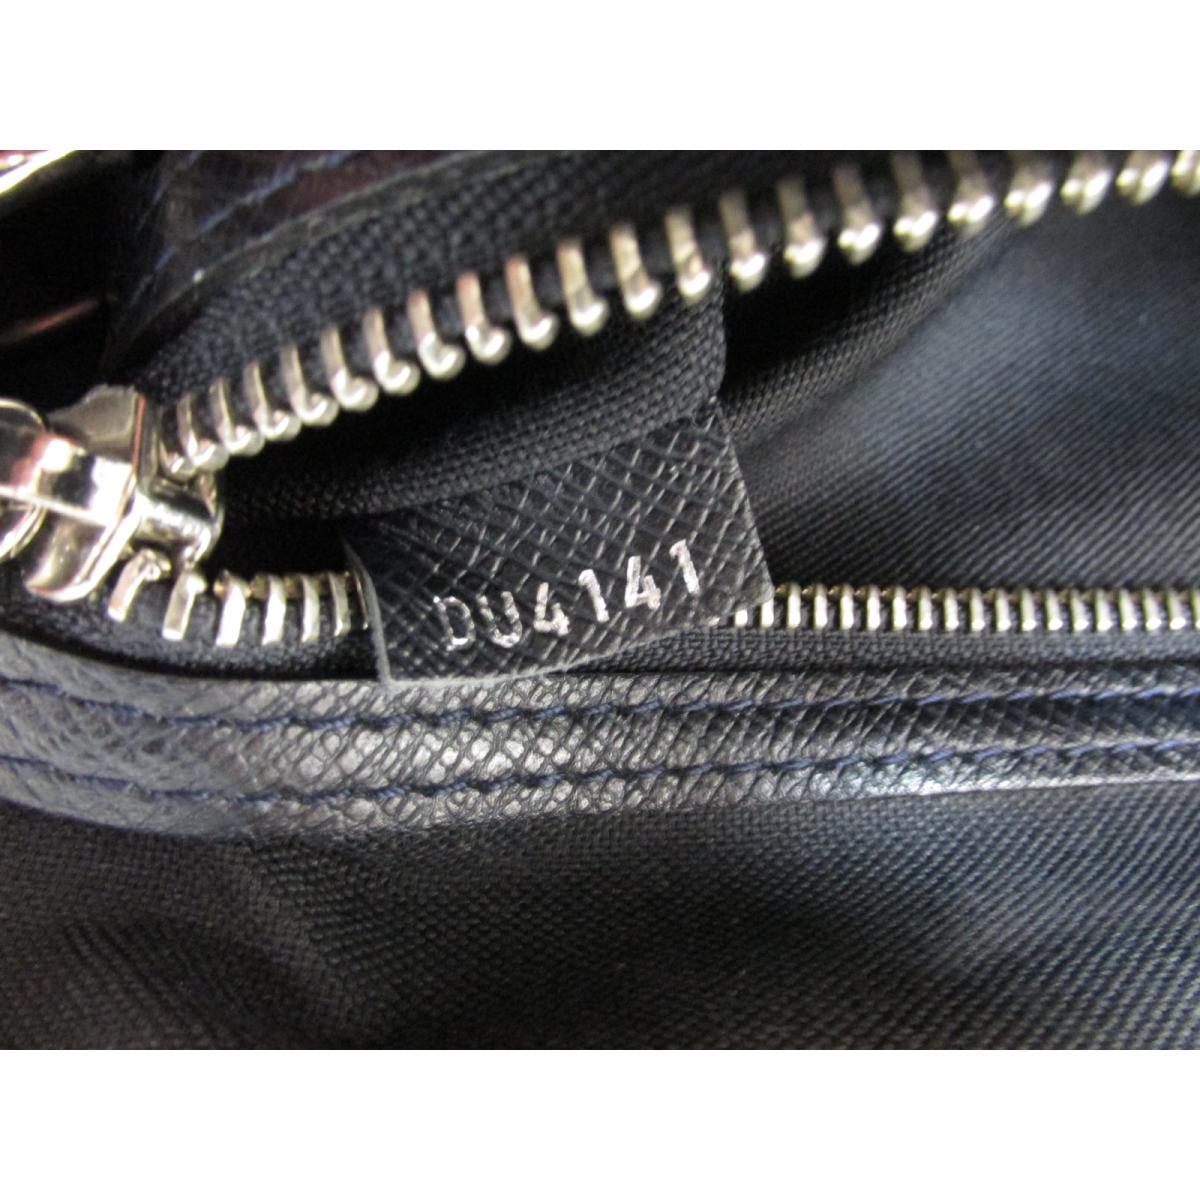 33e2c1f16378 Auth LOUIS VUITTON Roman MM Messenger Crossbody Shoulder Bag M32624 Taiga  Boreal